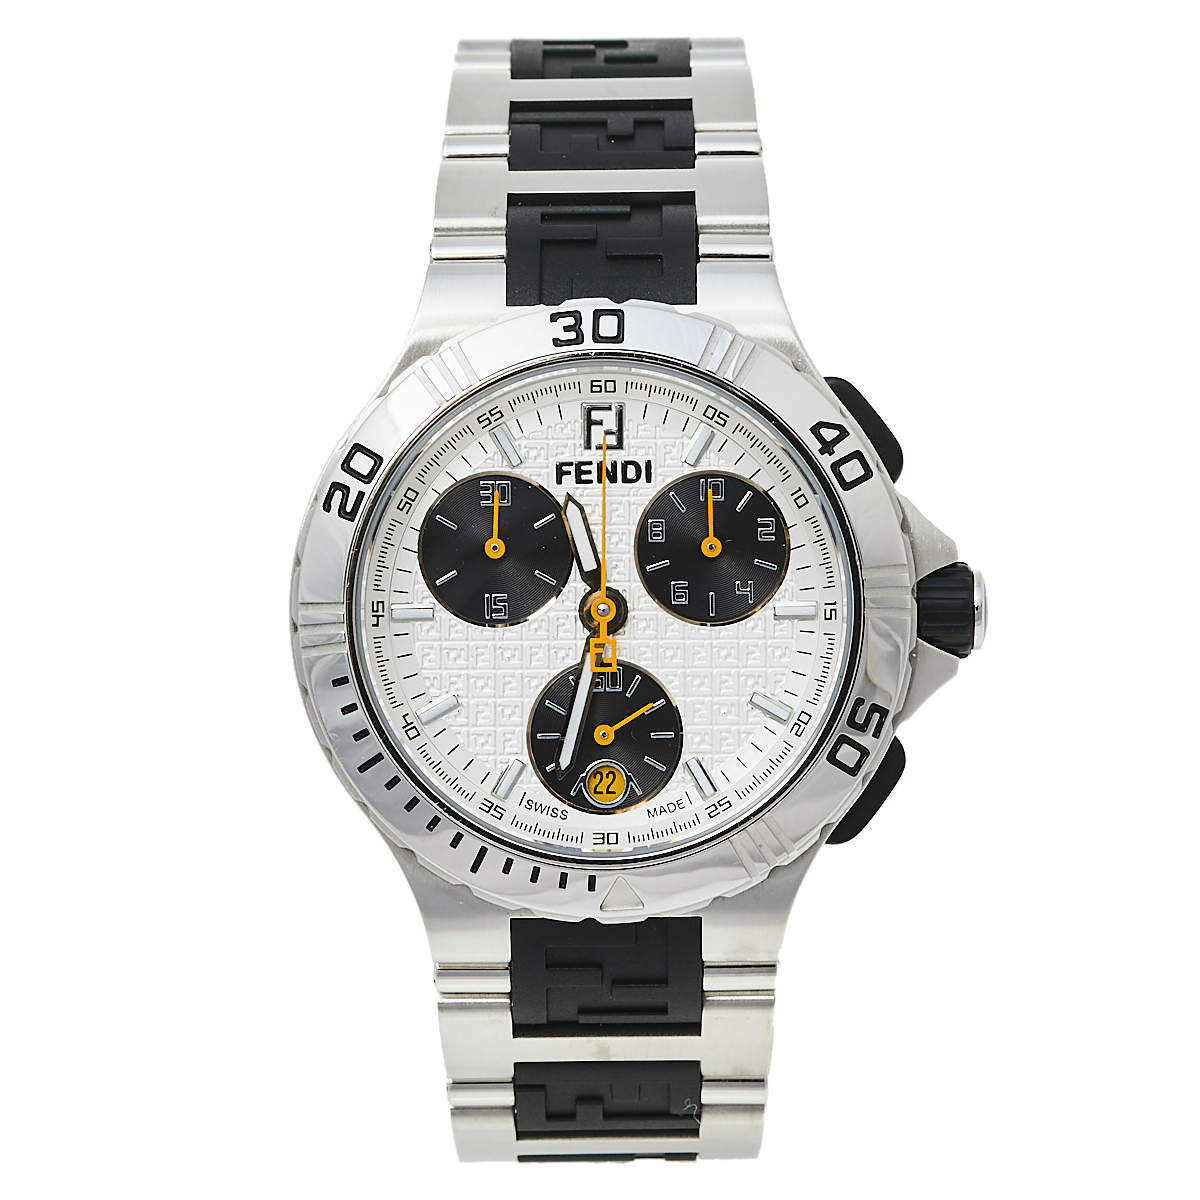 Fendi Silver Stainless Steel Chronograph 4800M Men's Wristwatch 38 mm